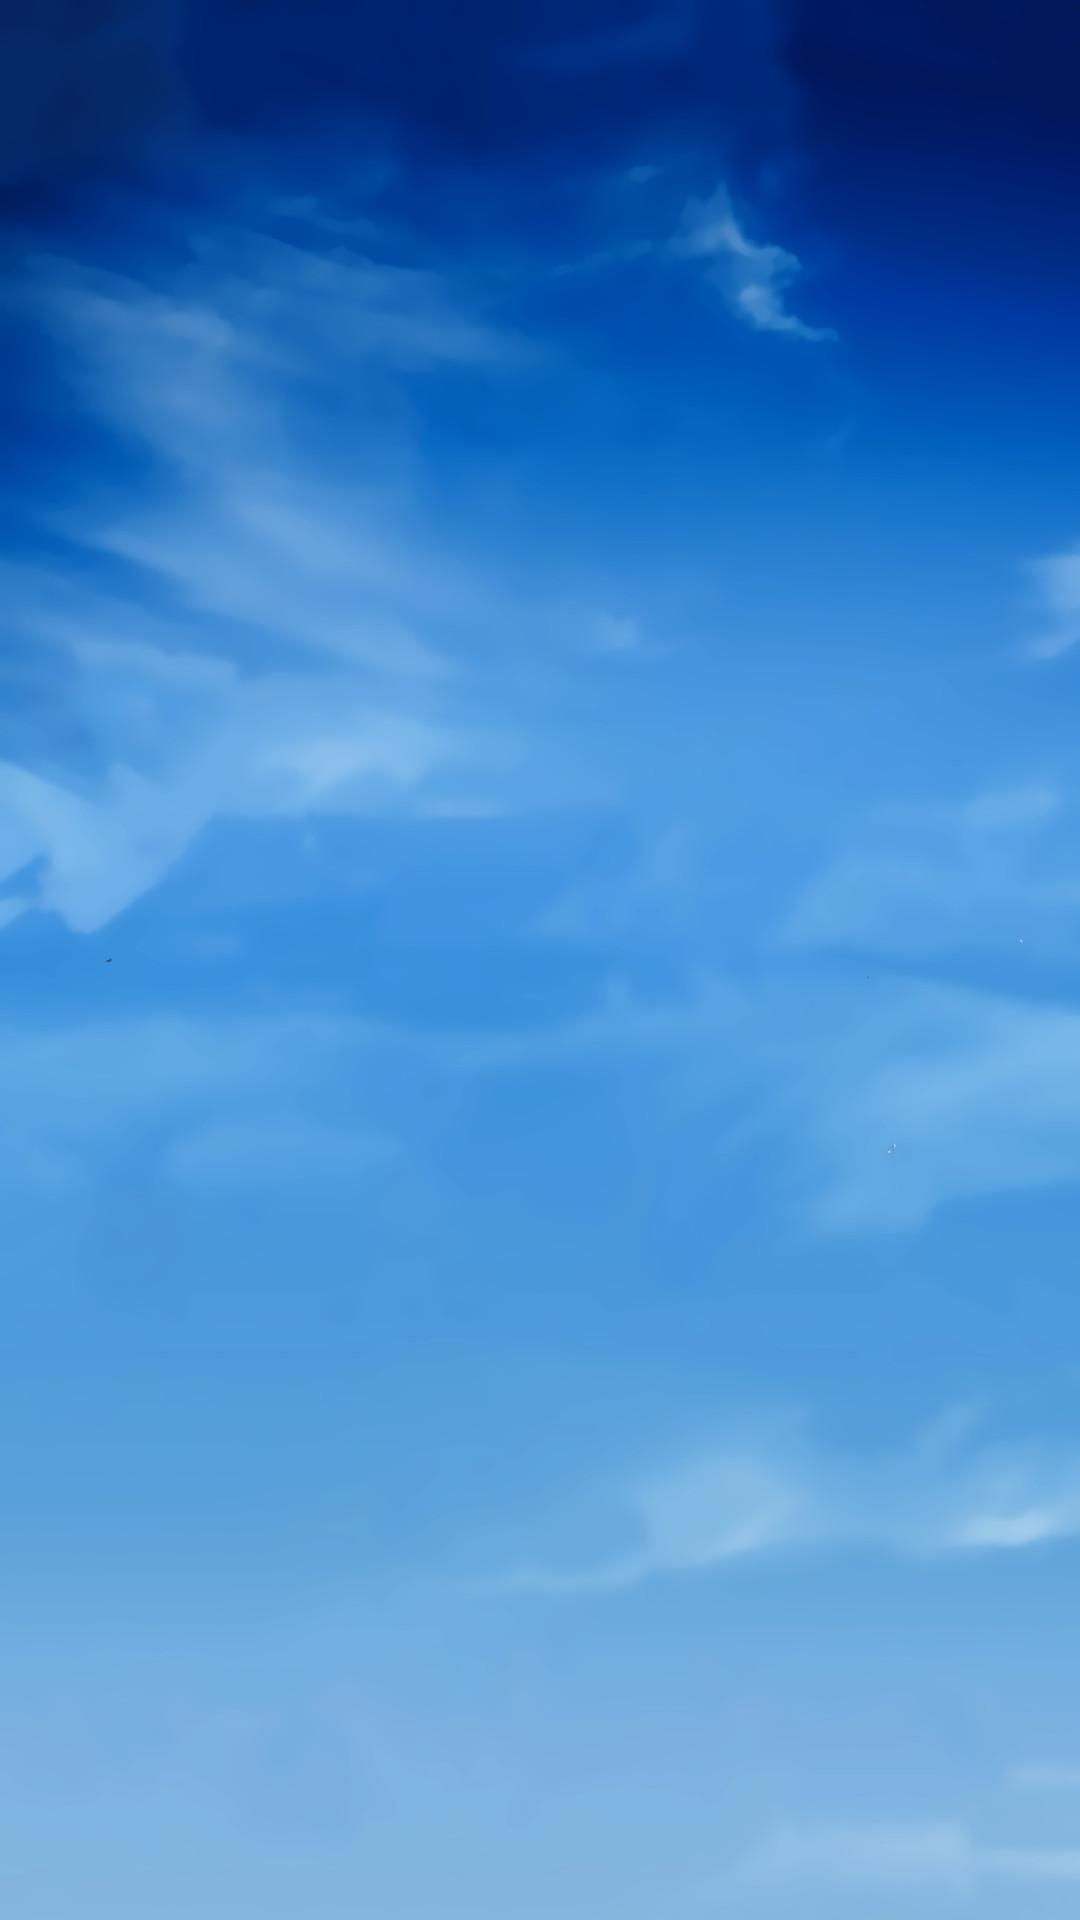 Blue Sky Smudge Clouds iPhone 6 Plus HD Wallpaper …